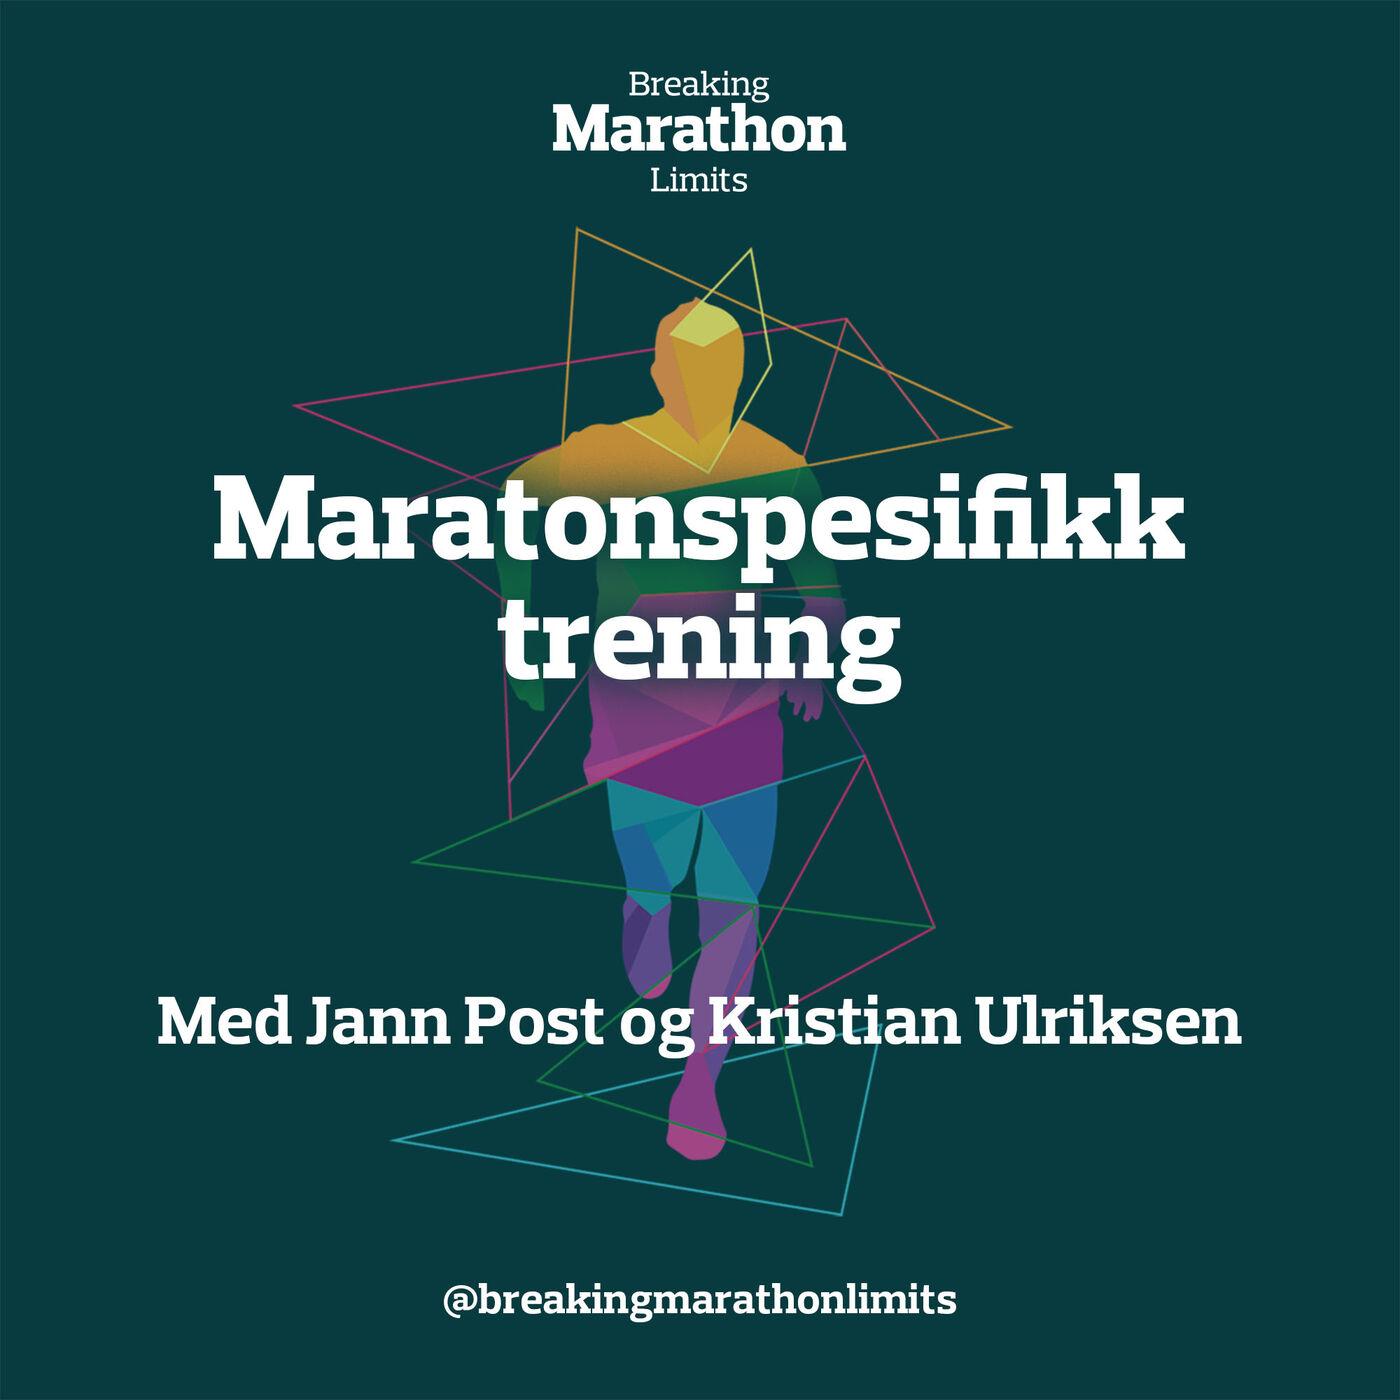 Maratonspesifikk trening